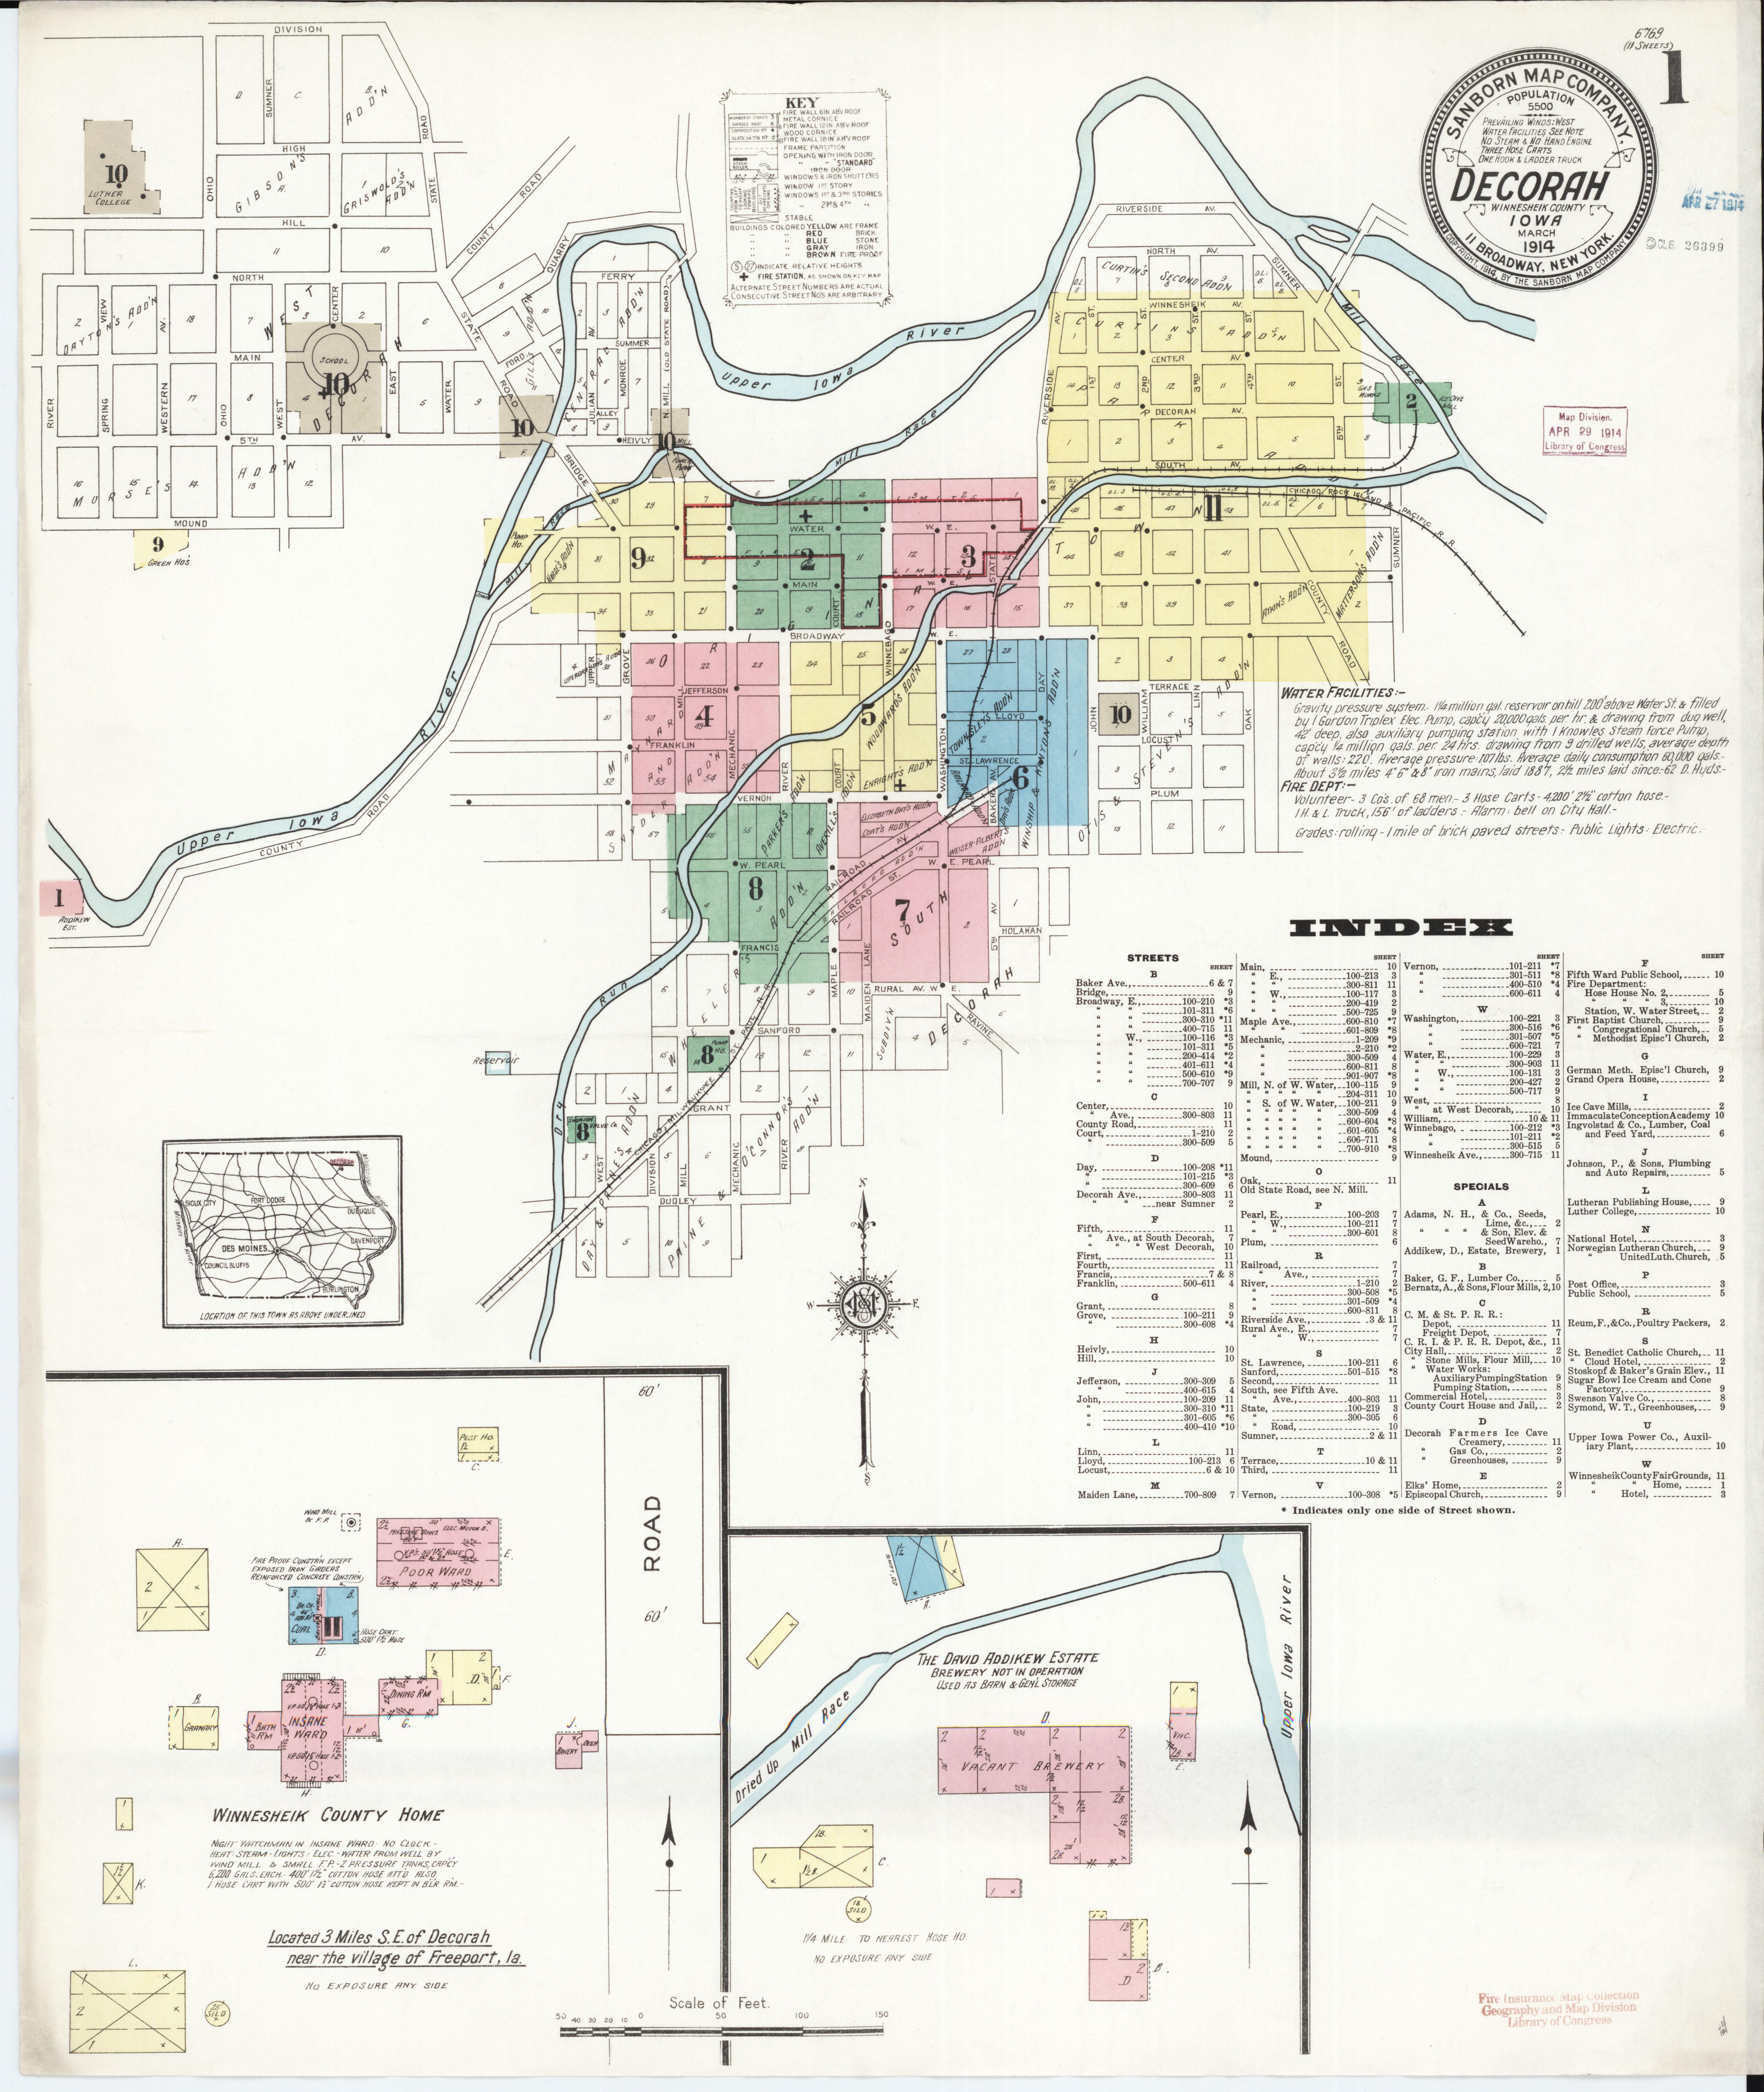 File:Sanborn Fire Insurance Map from Decorah, Winneshiek